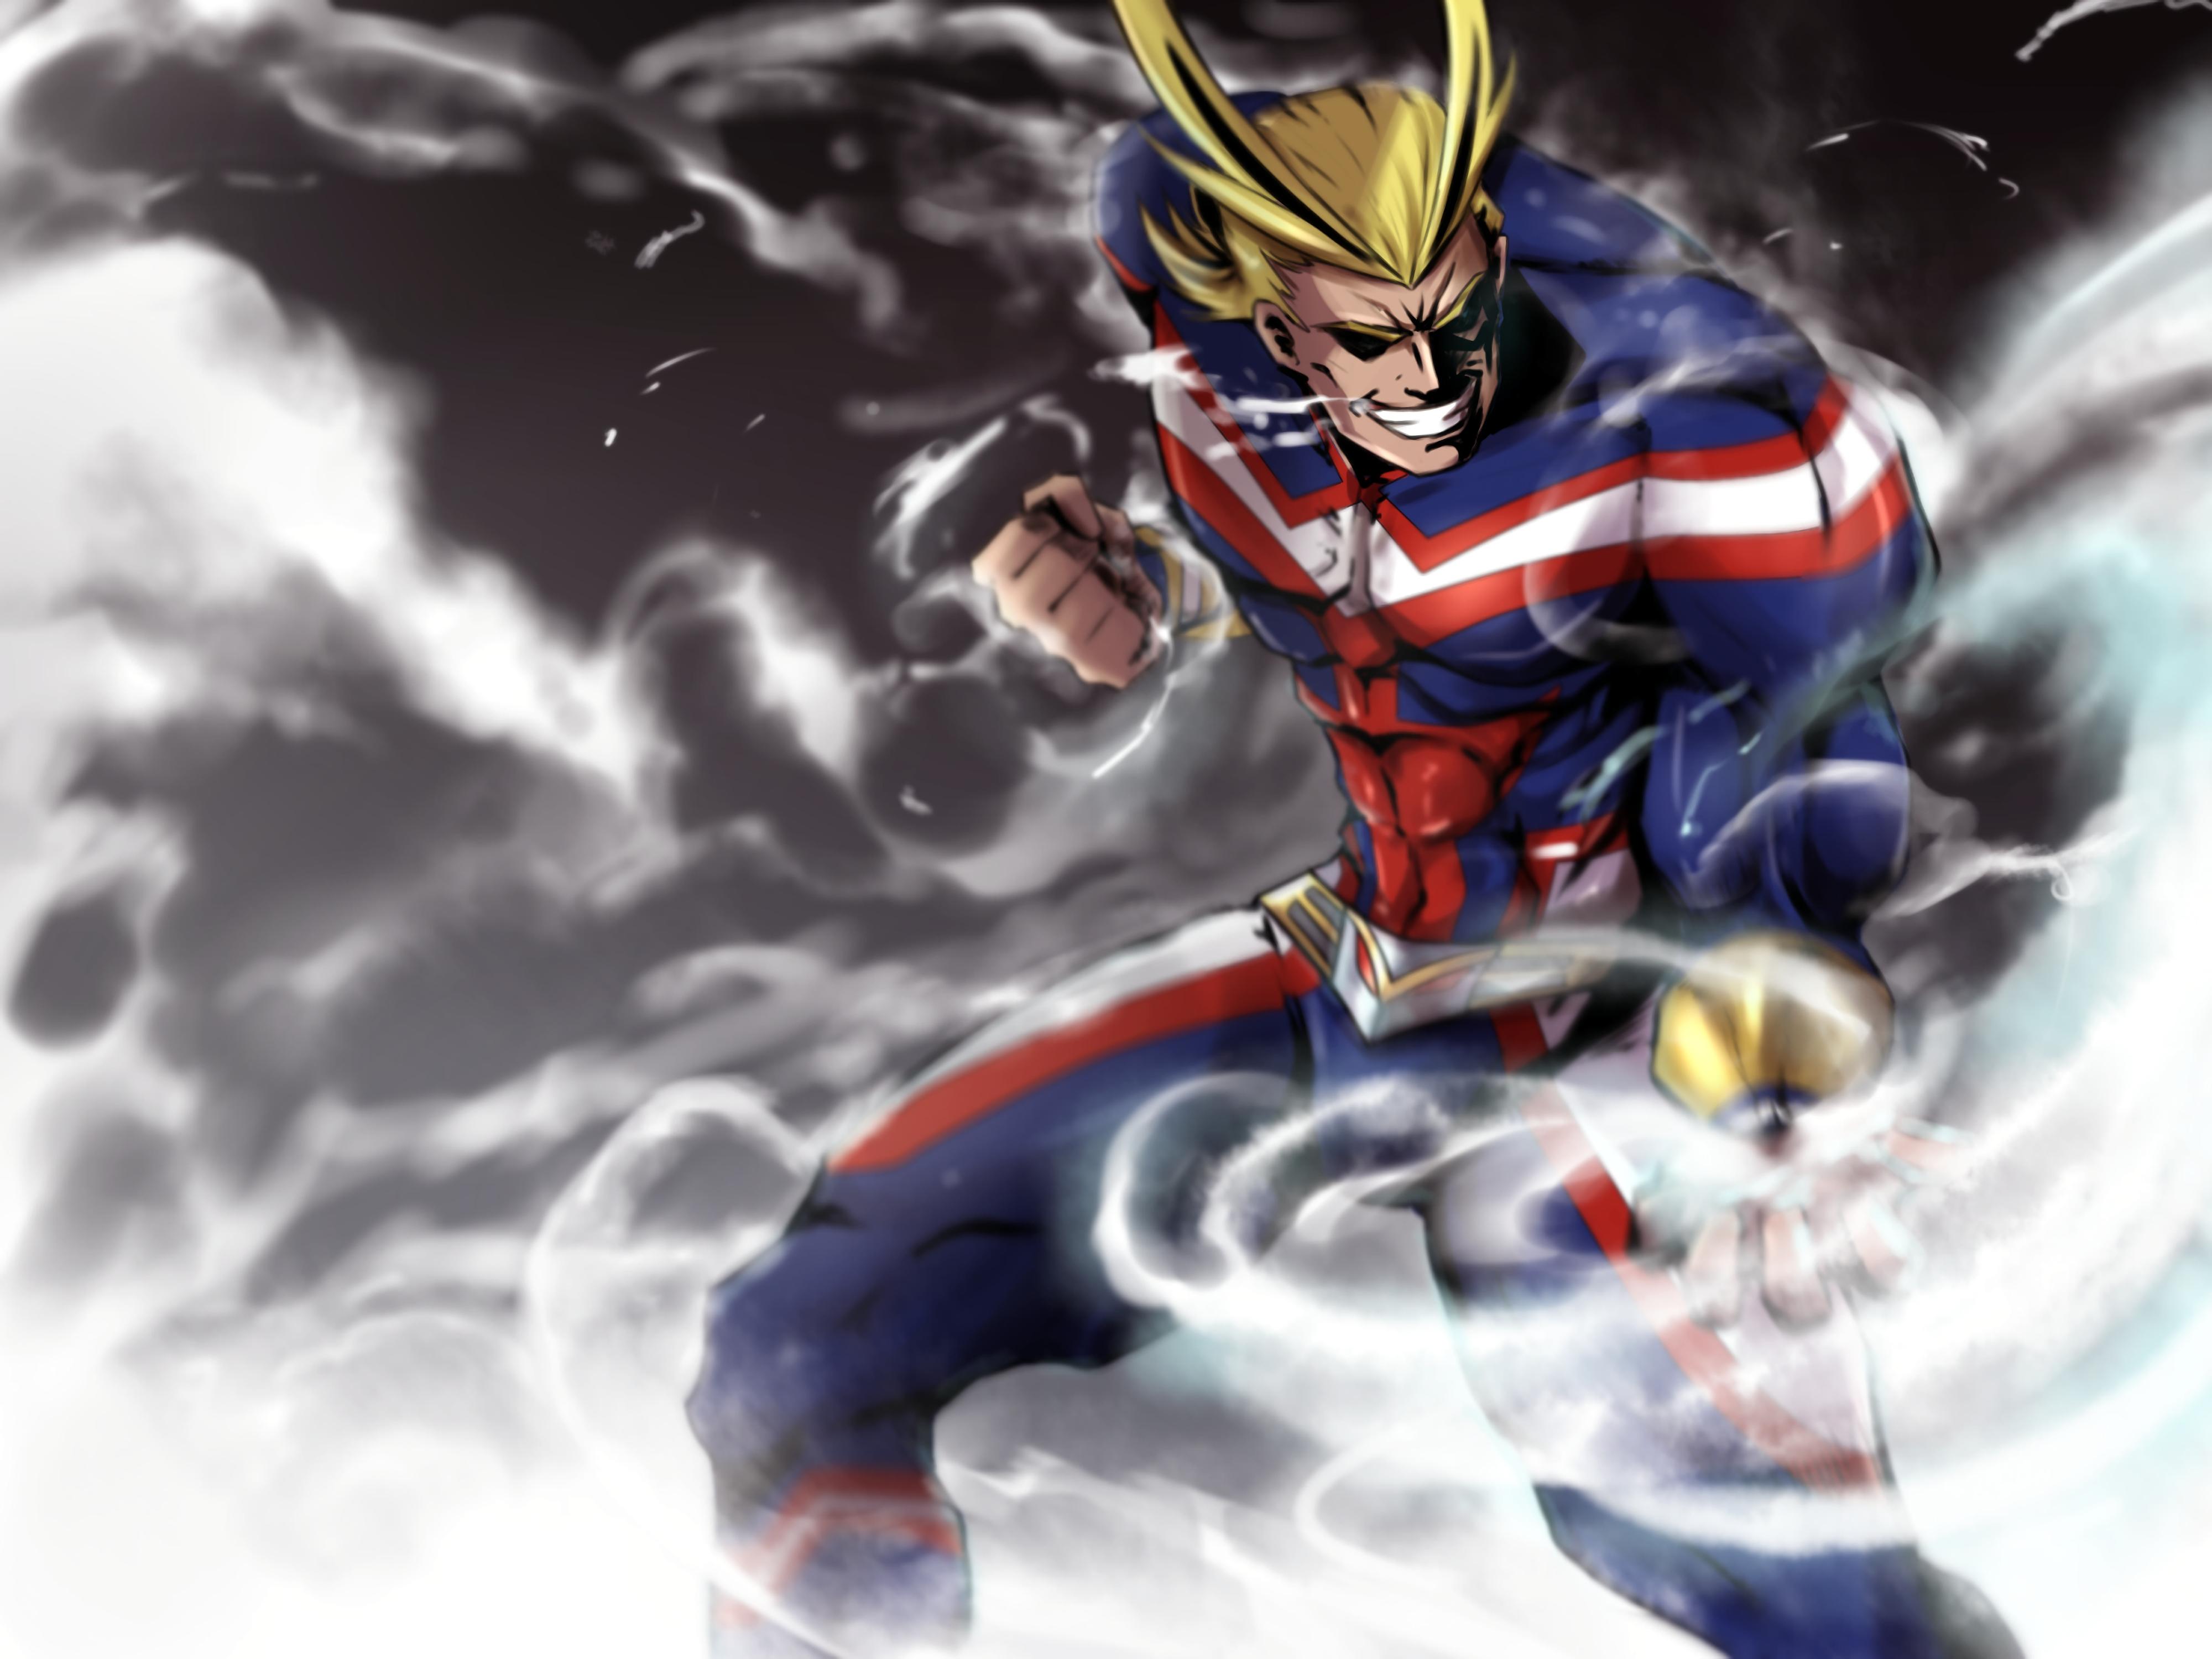 My Hero Academia 4k Ultra Hd Wallpaper Hintergrund